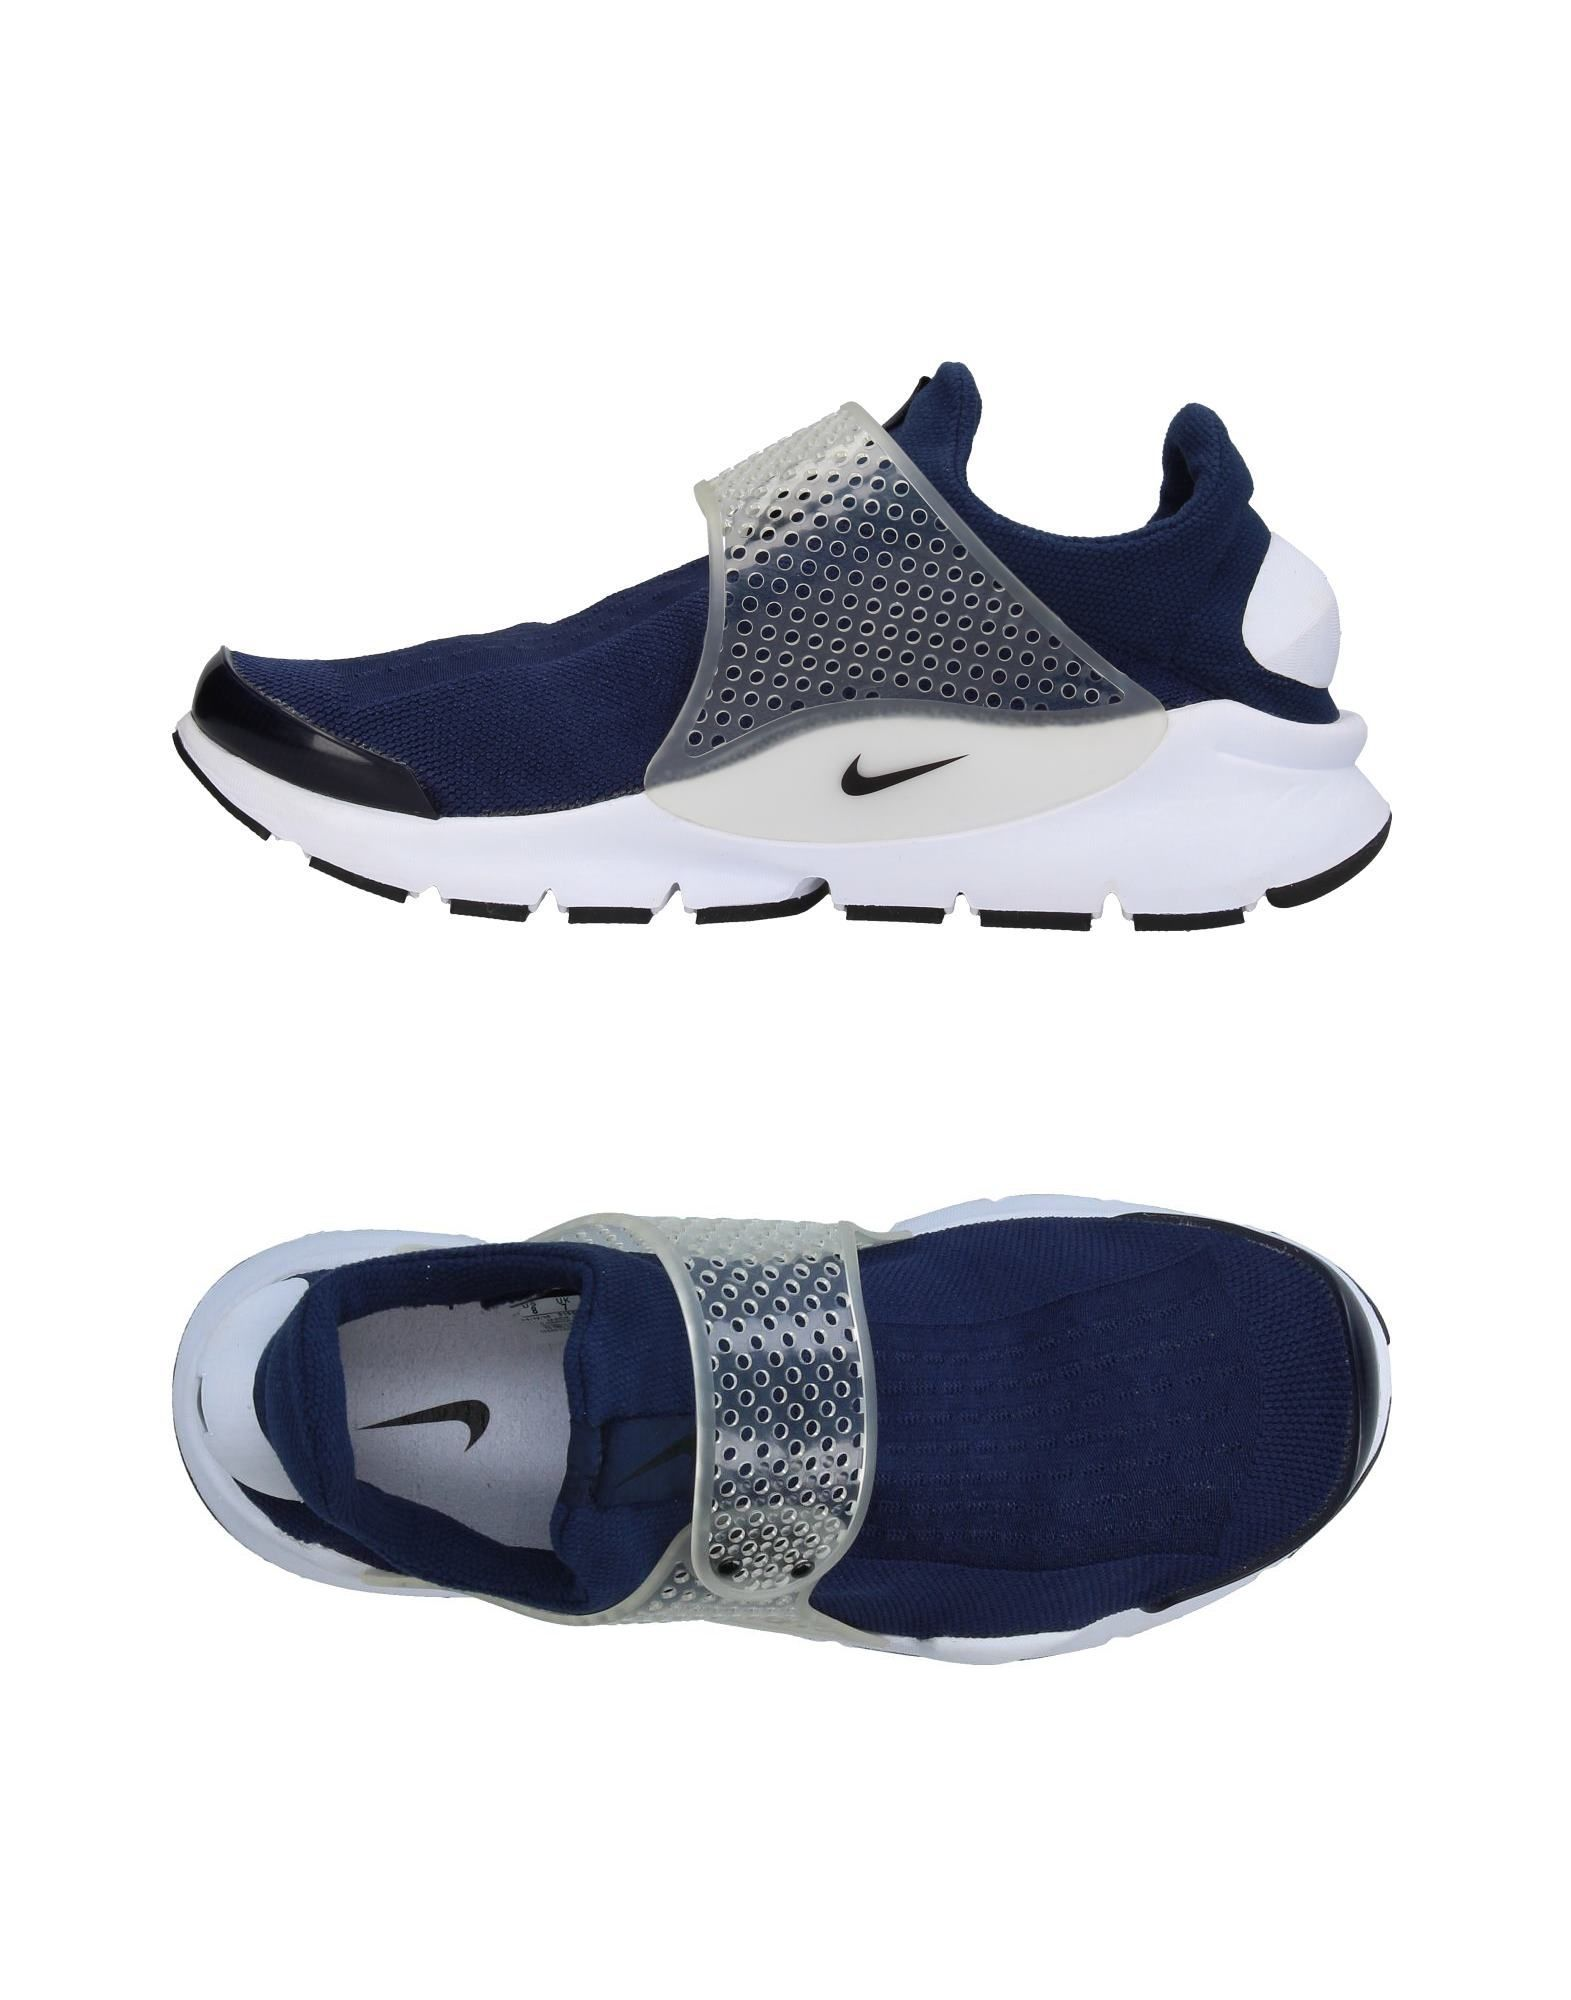 Moda Scarpe Nike da Ginnastica Nike Scarpe Uomo - 11359566XG a35a83